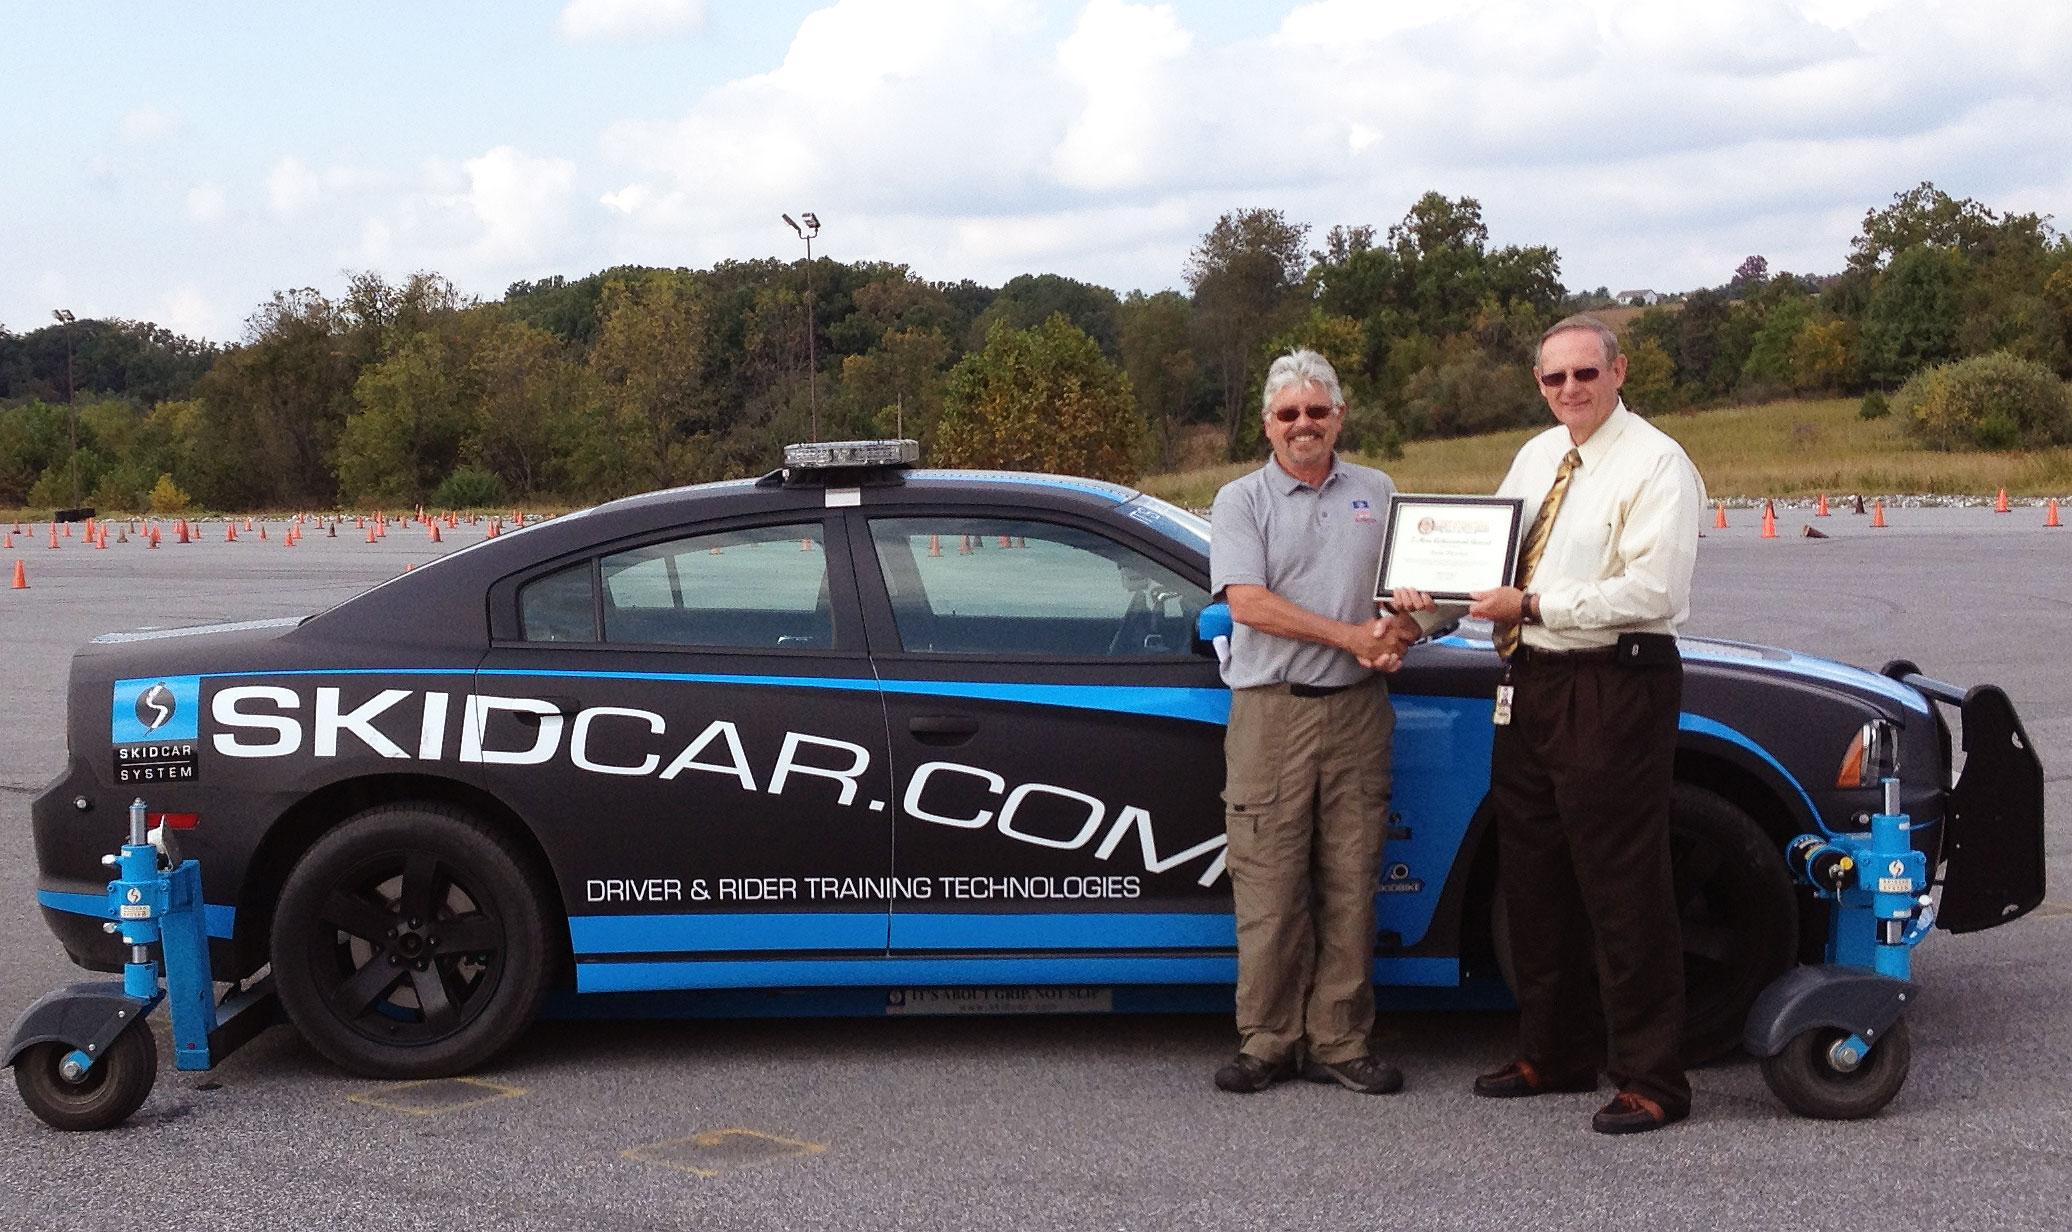 SkidCar System Inc. Receives Award from ALERT International